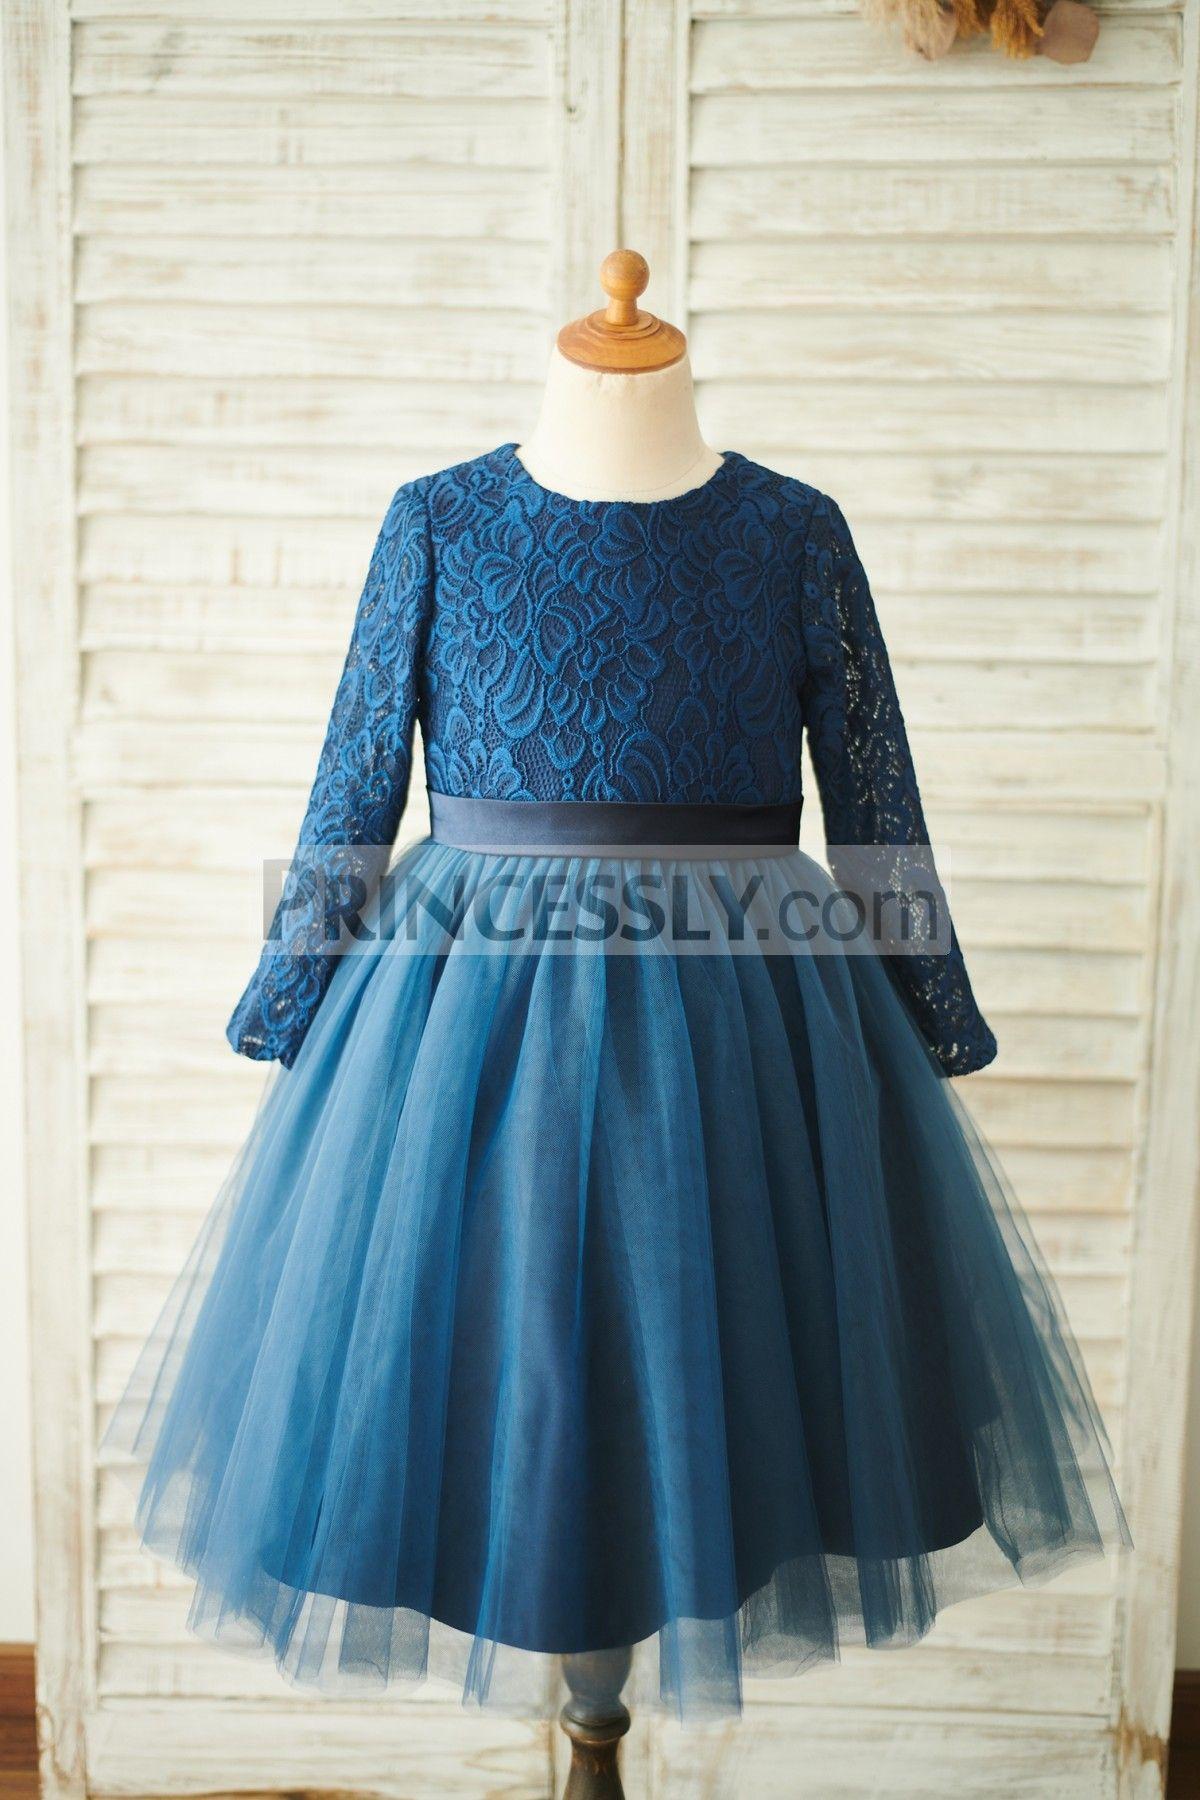 7e0659c5356 Navy Blue Lace Tulle Long Sleeves Wedding Flower Girl Dress